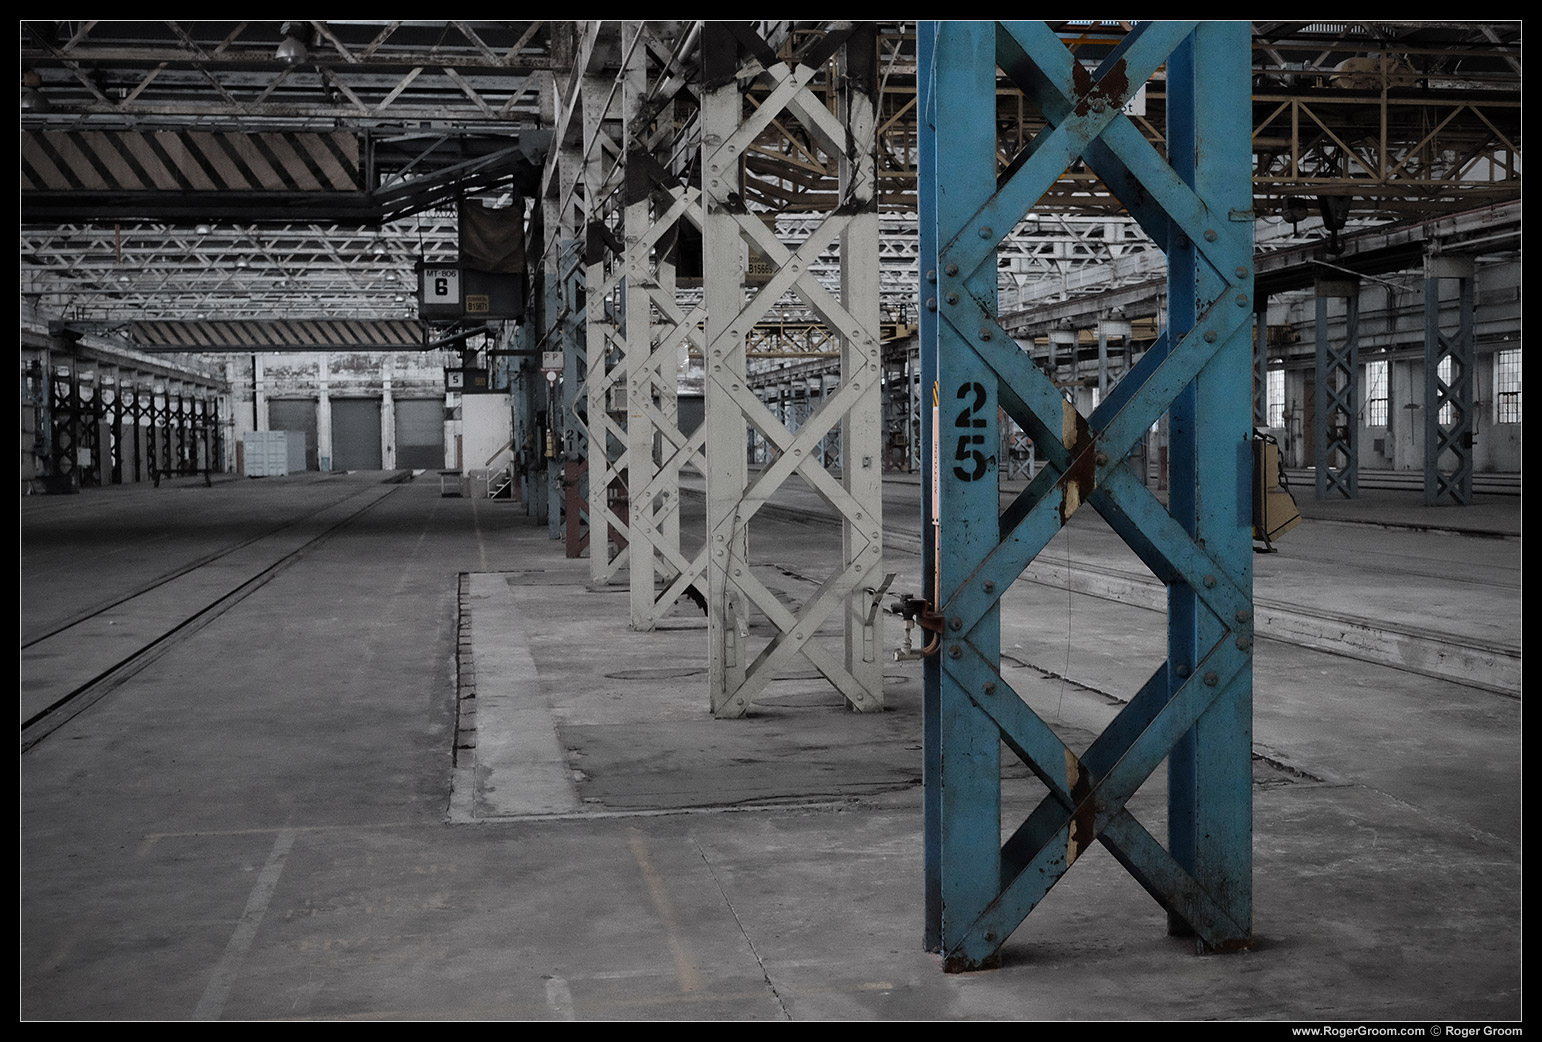 Midland Railway Workshops inside.